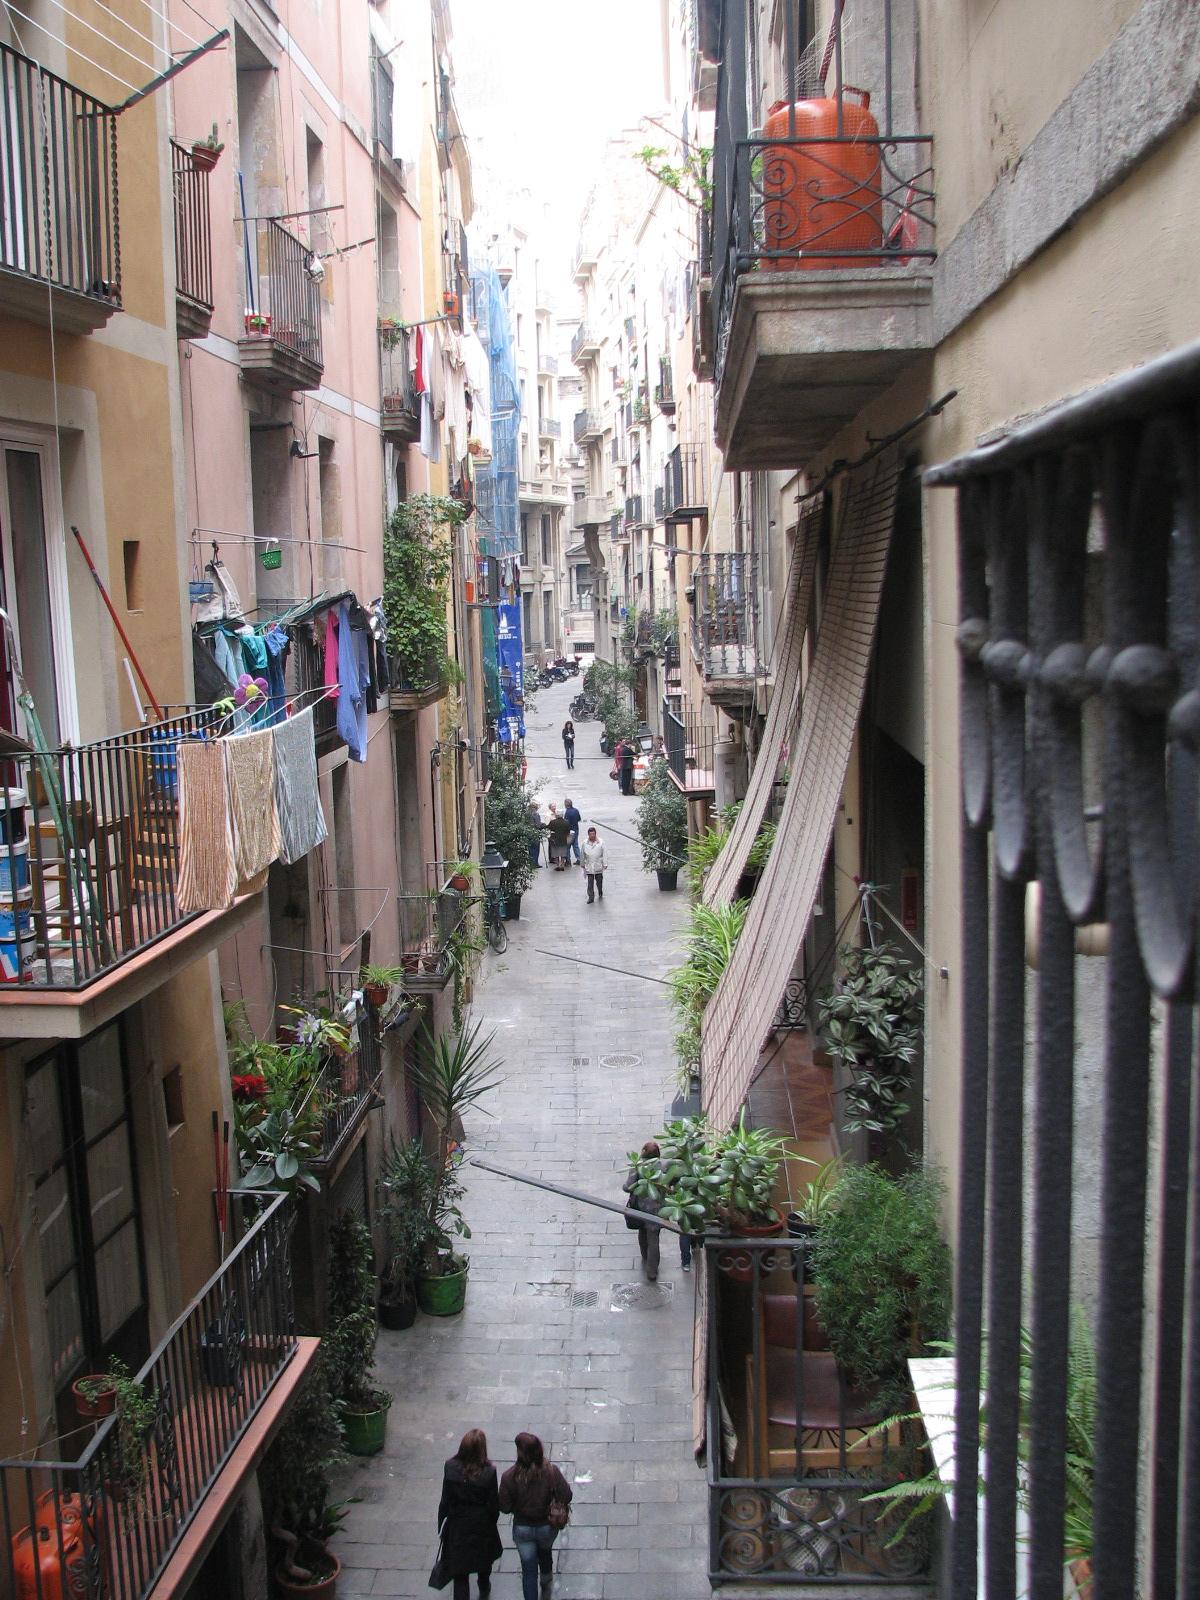 Barrio de la ribera wikipedia la enciclopedia libre - Calle princesa barcelona ...